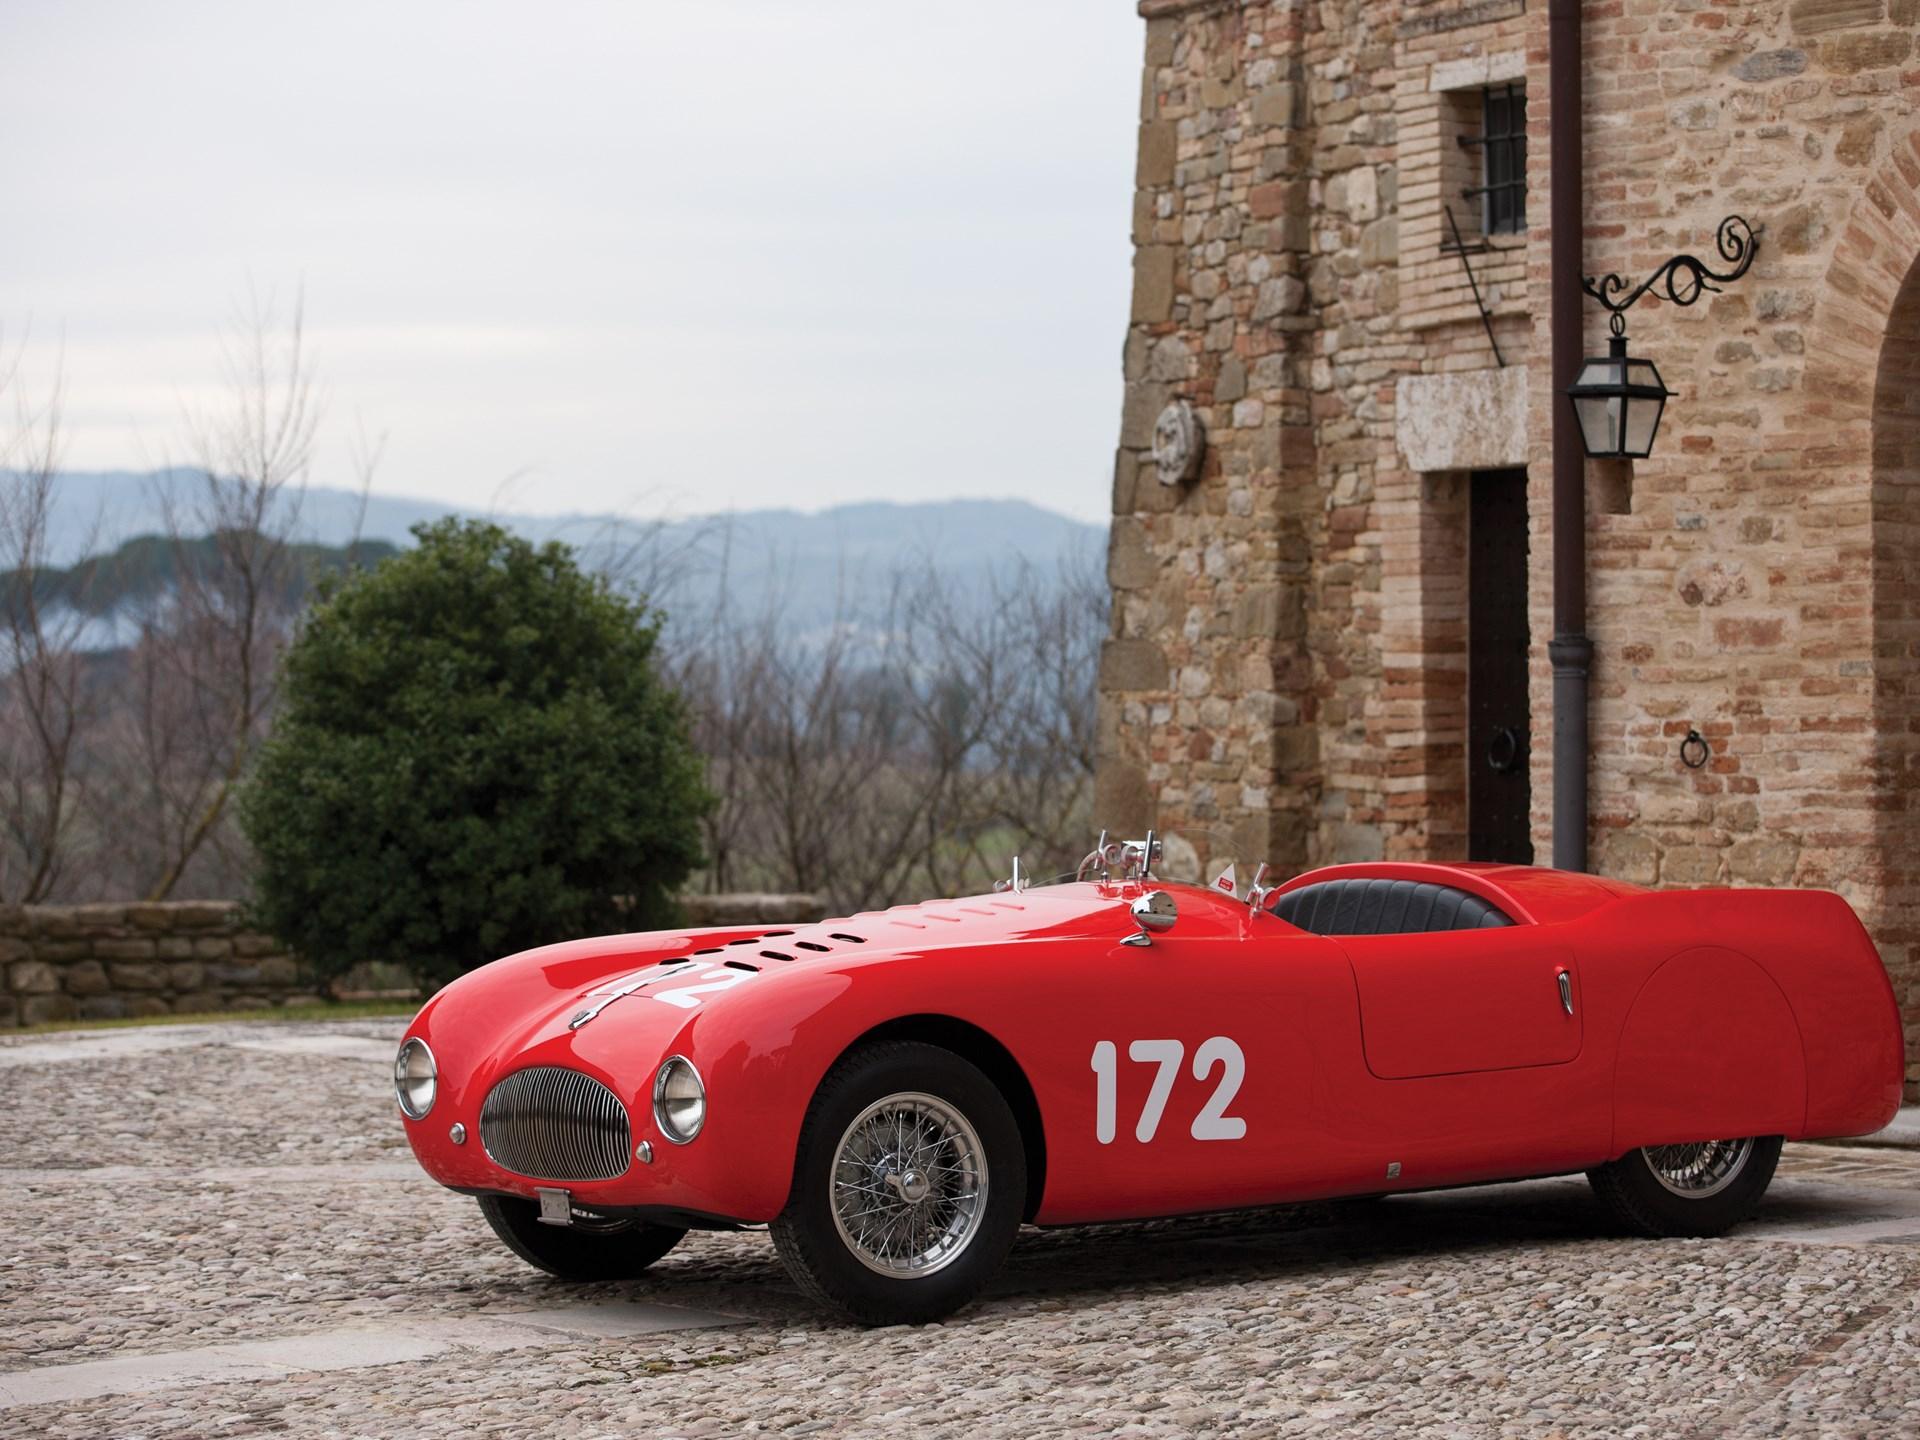 1947 Cisitalia 202 SMM 'Nuvolari' Spyder by Carrozzeria Garella